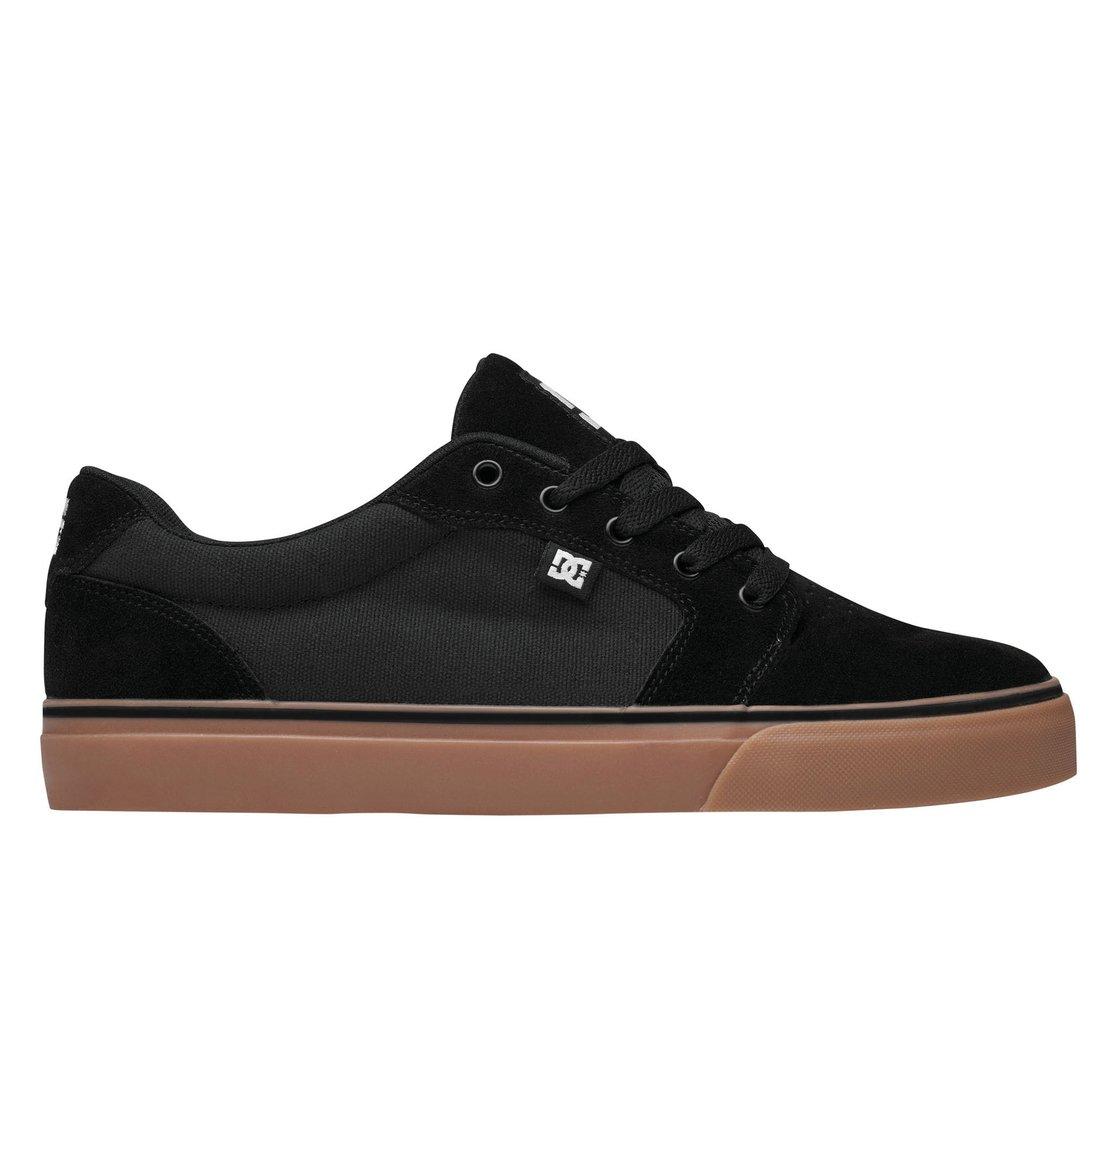 cfc473646c3d6 0 Anvil - Zapatillas bajas para Hombre 303190 DC Shoes